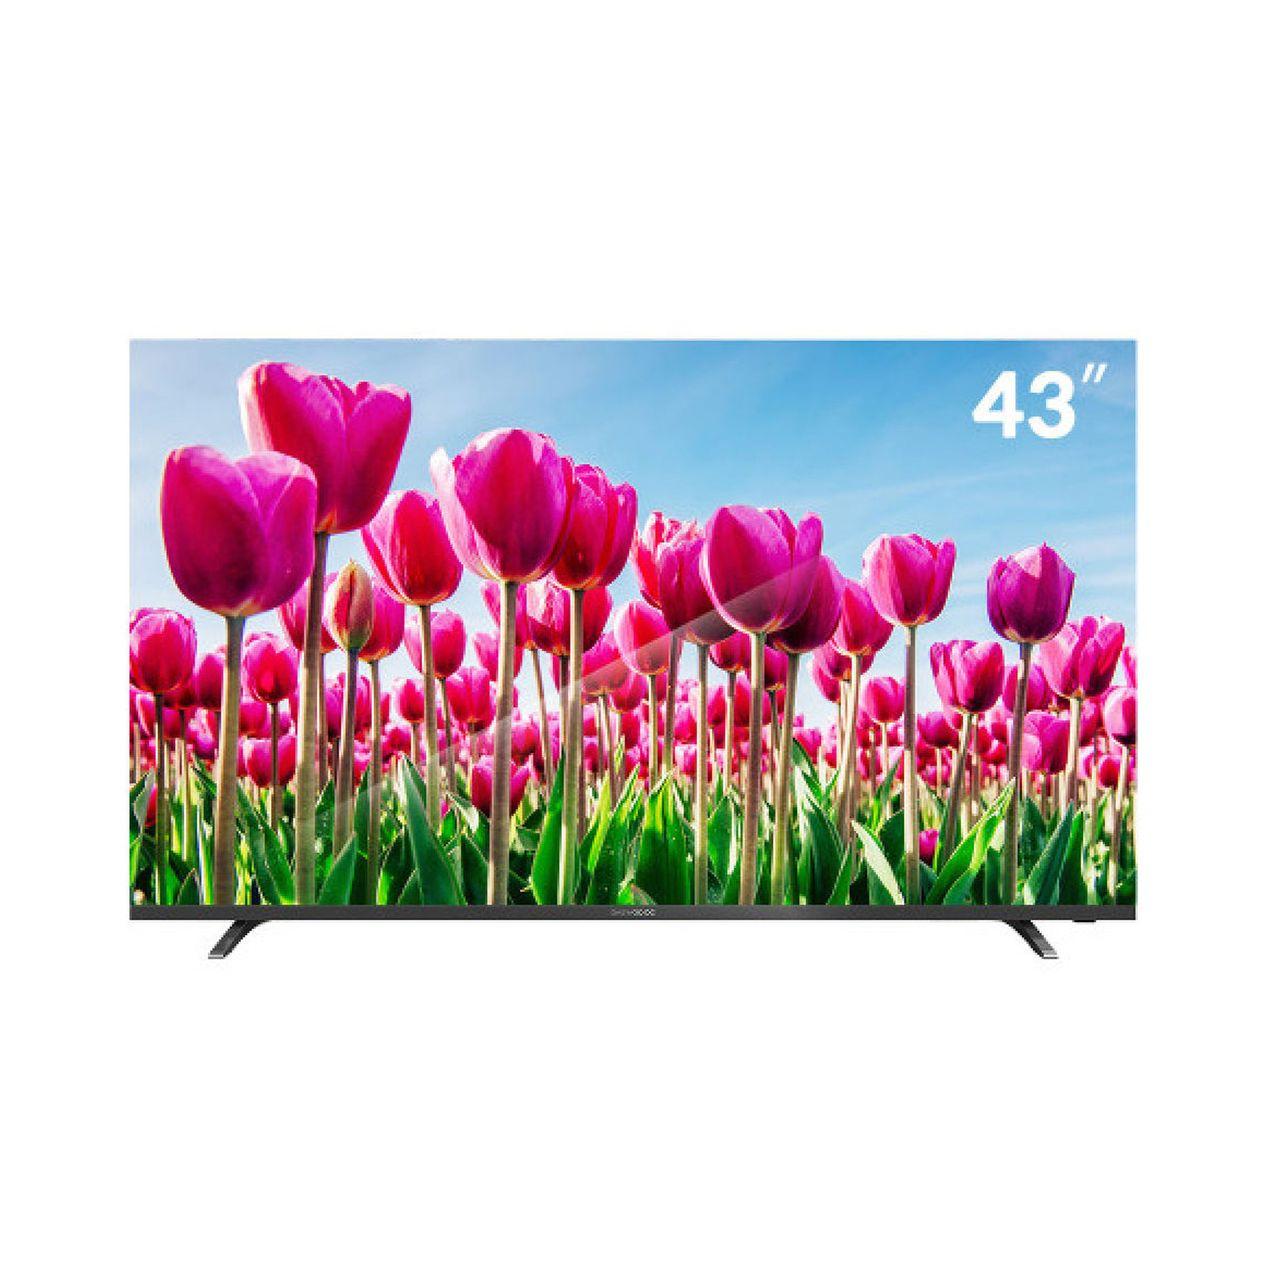 تلویزیون ال ای دی دوو مدل DLE-43K4411 سایز 43 اینچ